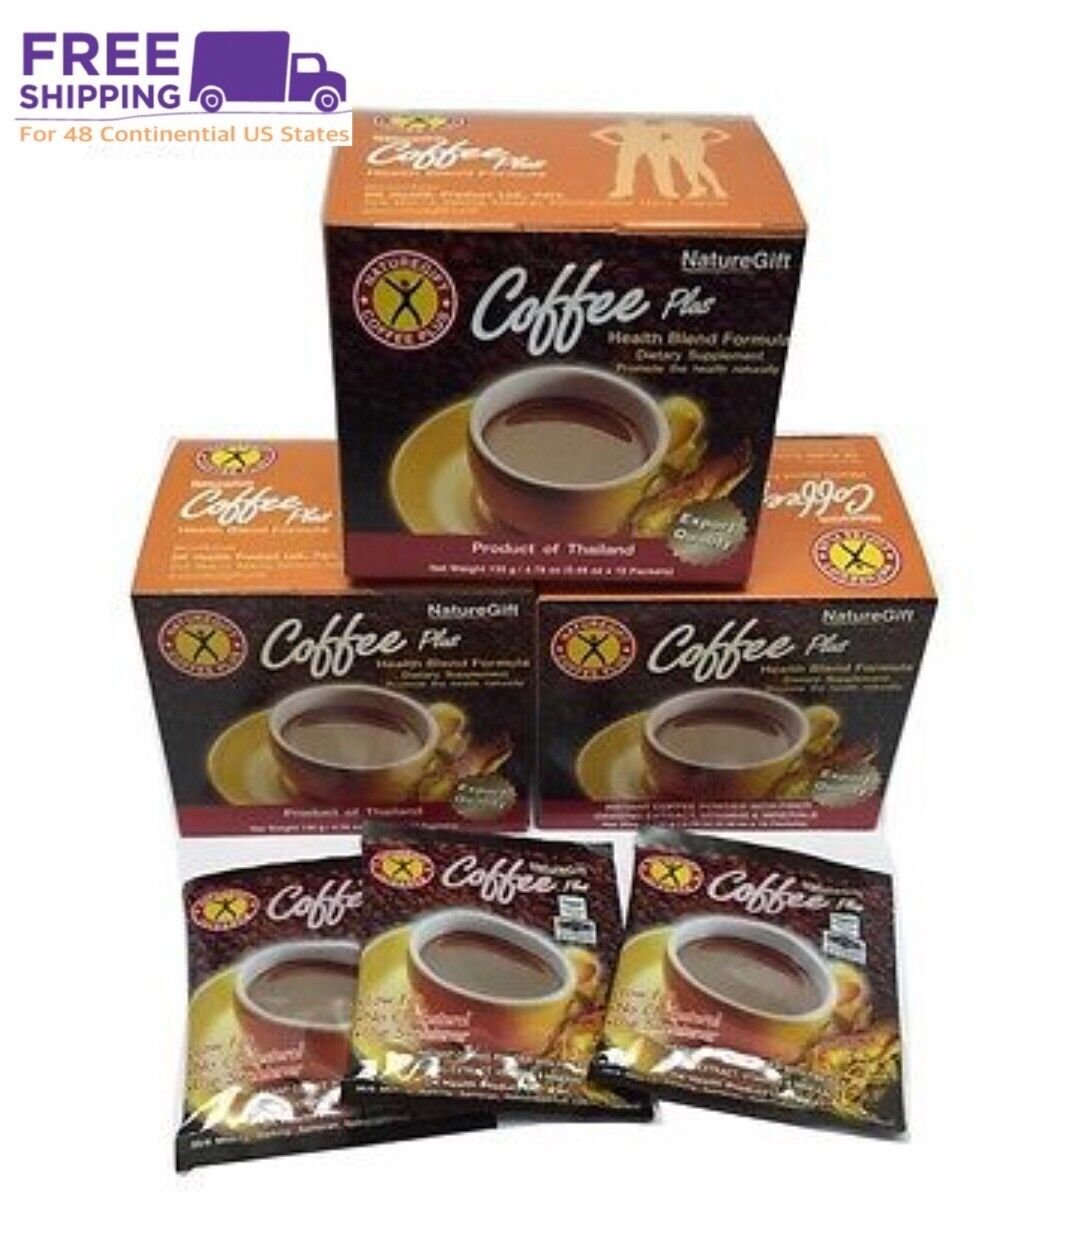 Naturegift Coffee Plus Weight Loss Diet. 10 box : 100 small bags